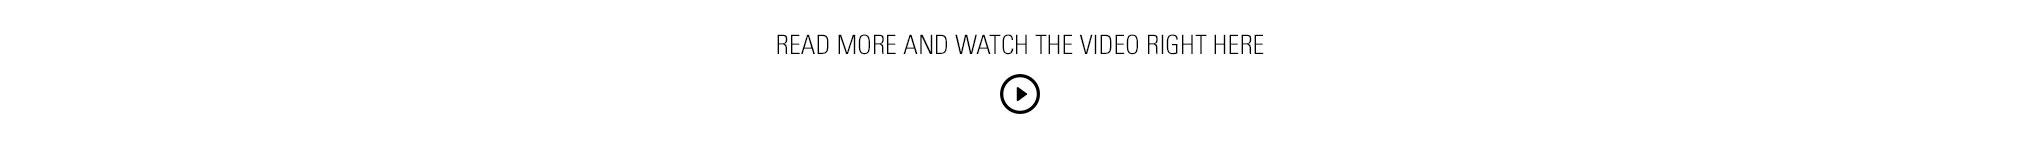 Streetmachine - WATCH NOW: KYNDELMISSE